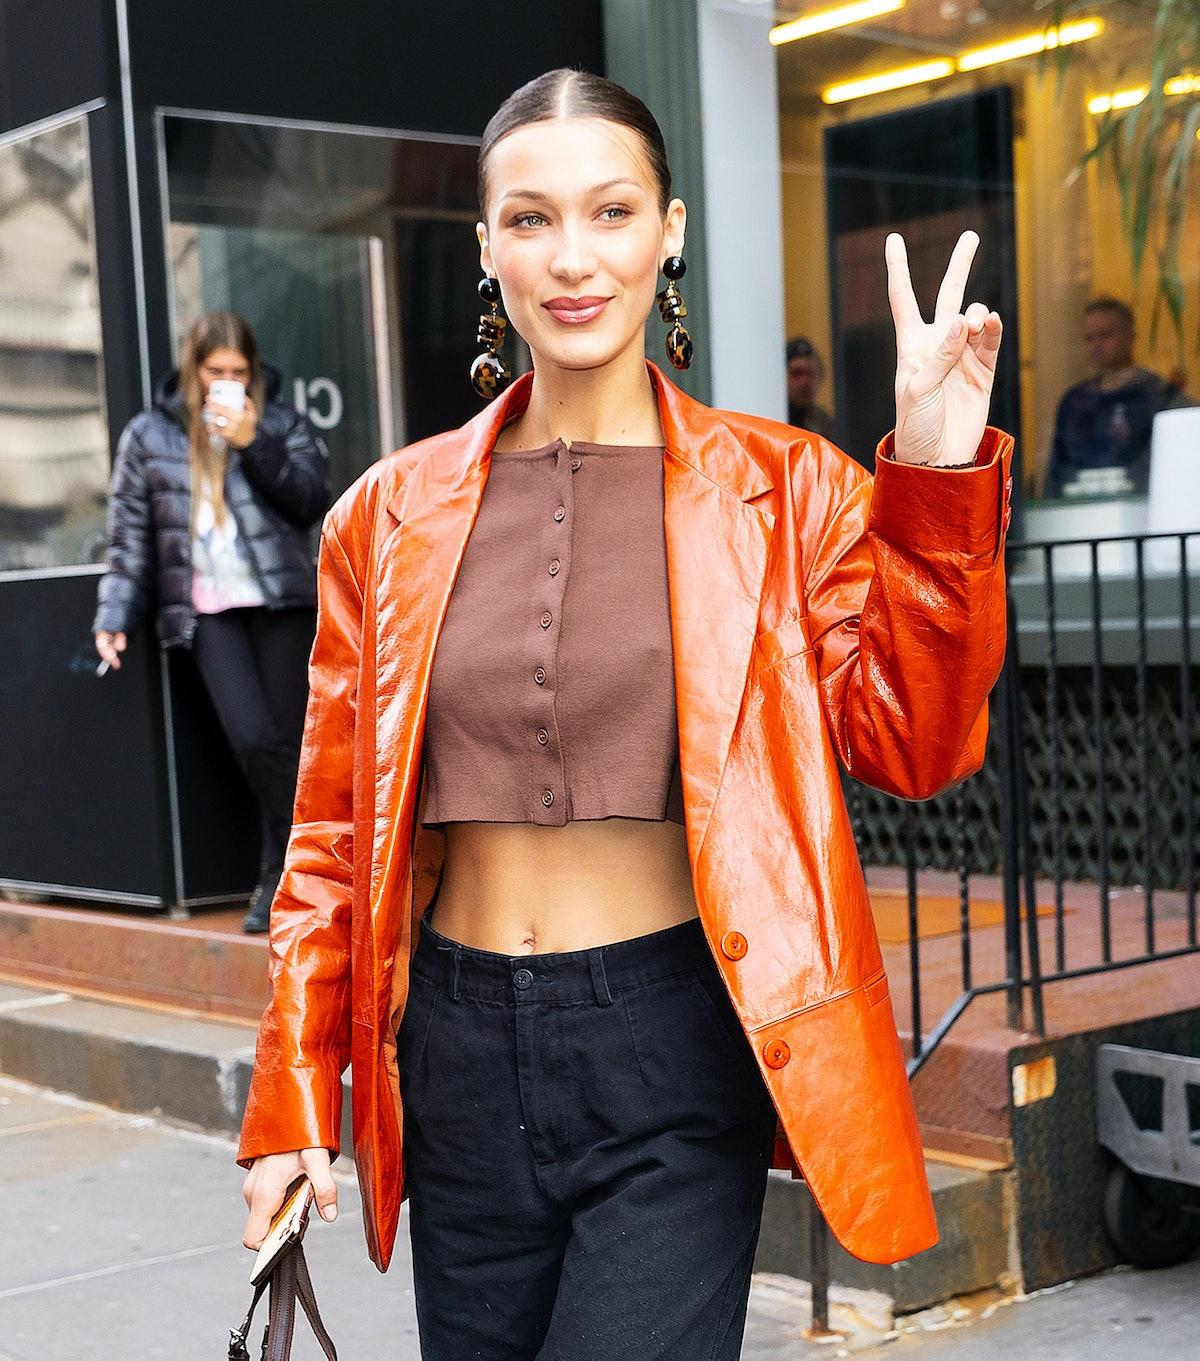 NEW YORK, NEW YORK - FEBRUARY 12: Bella Hadid at Sadelle on February 12, 2020 in New York City. (Pho...